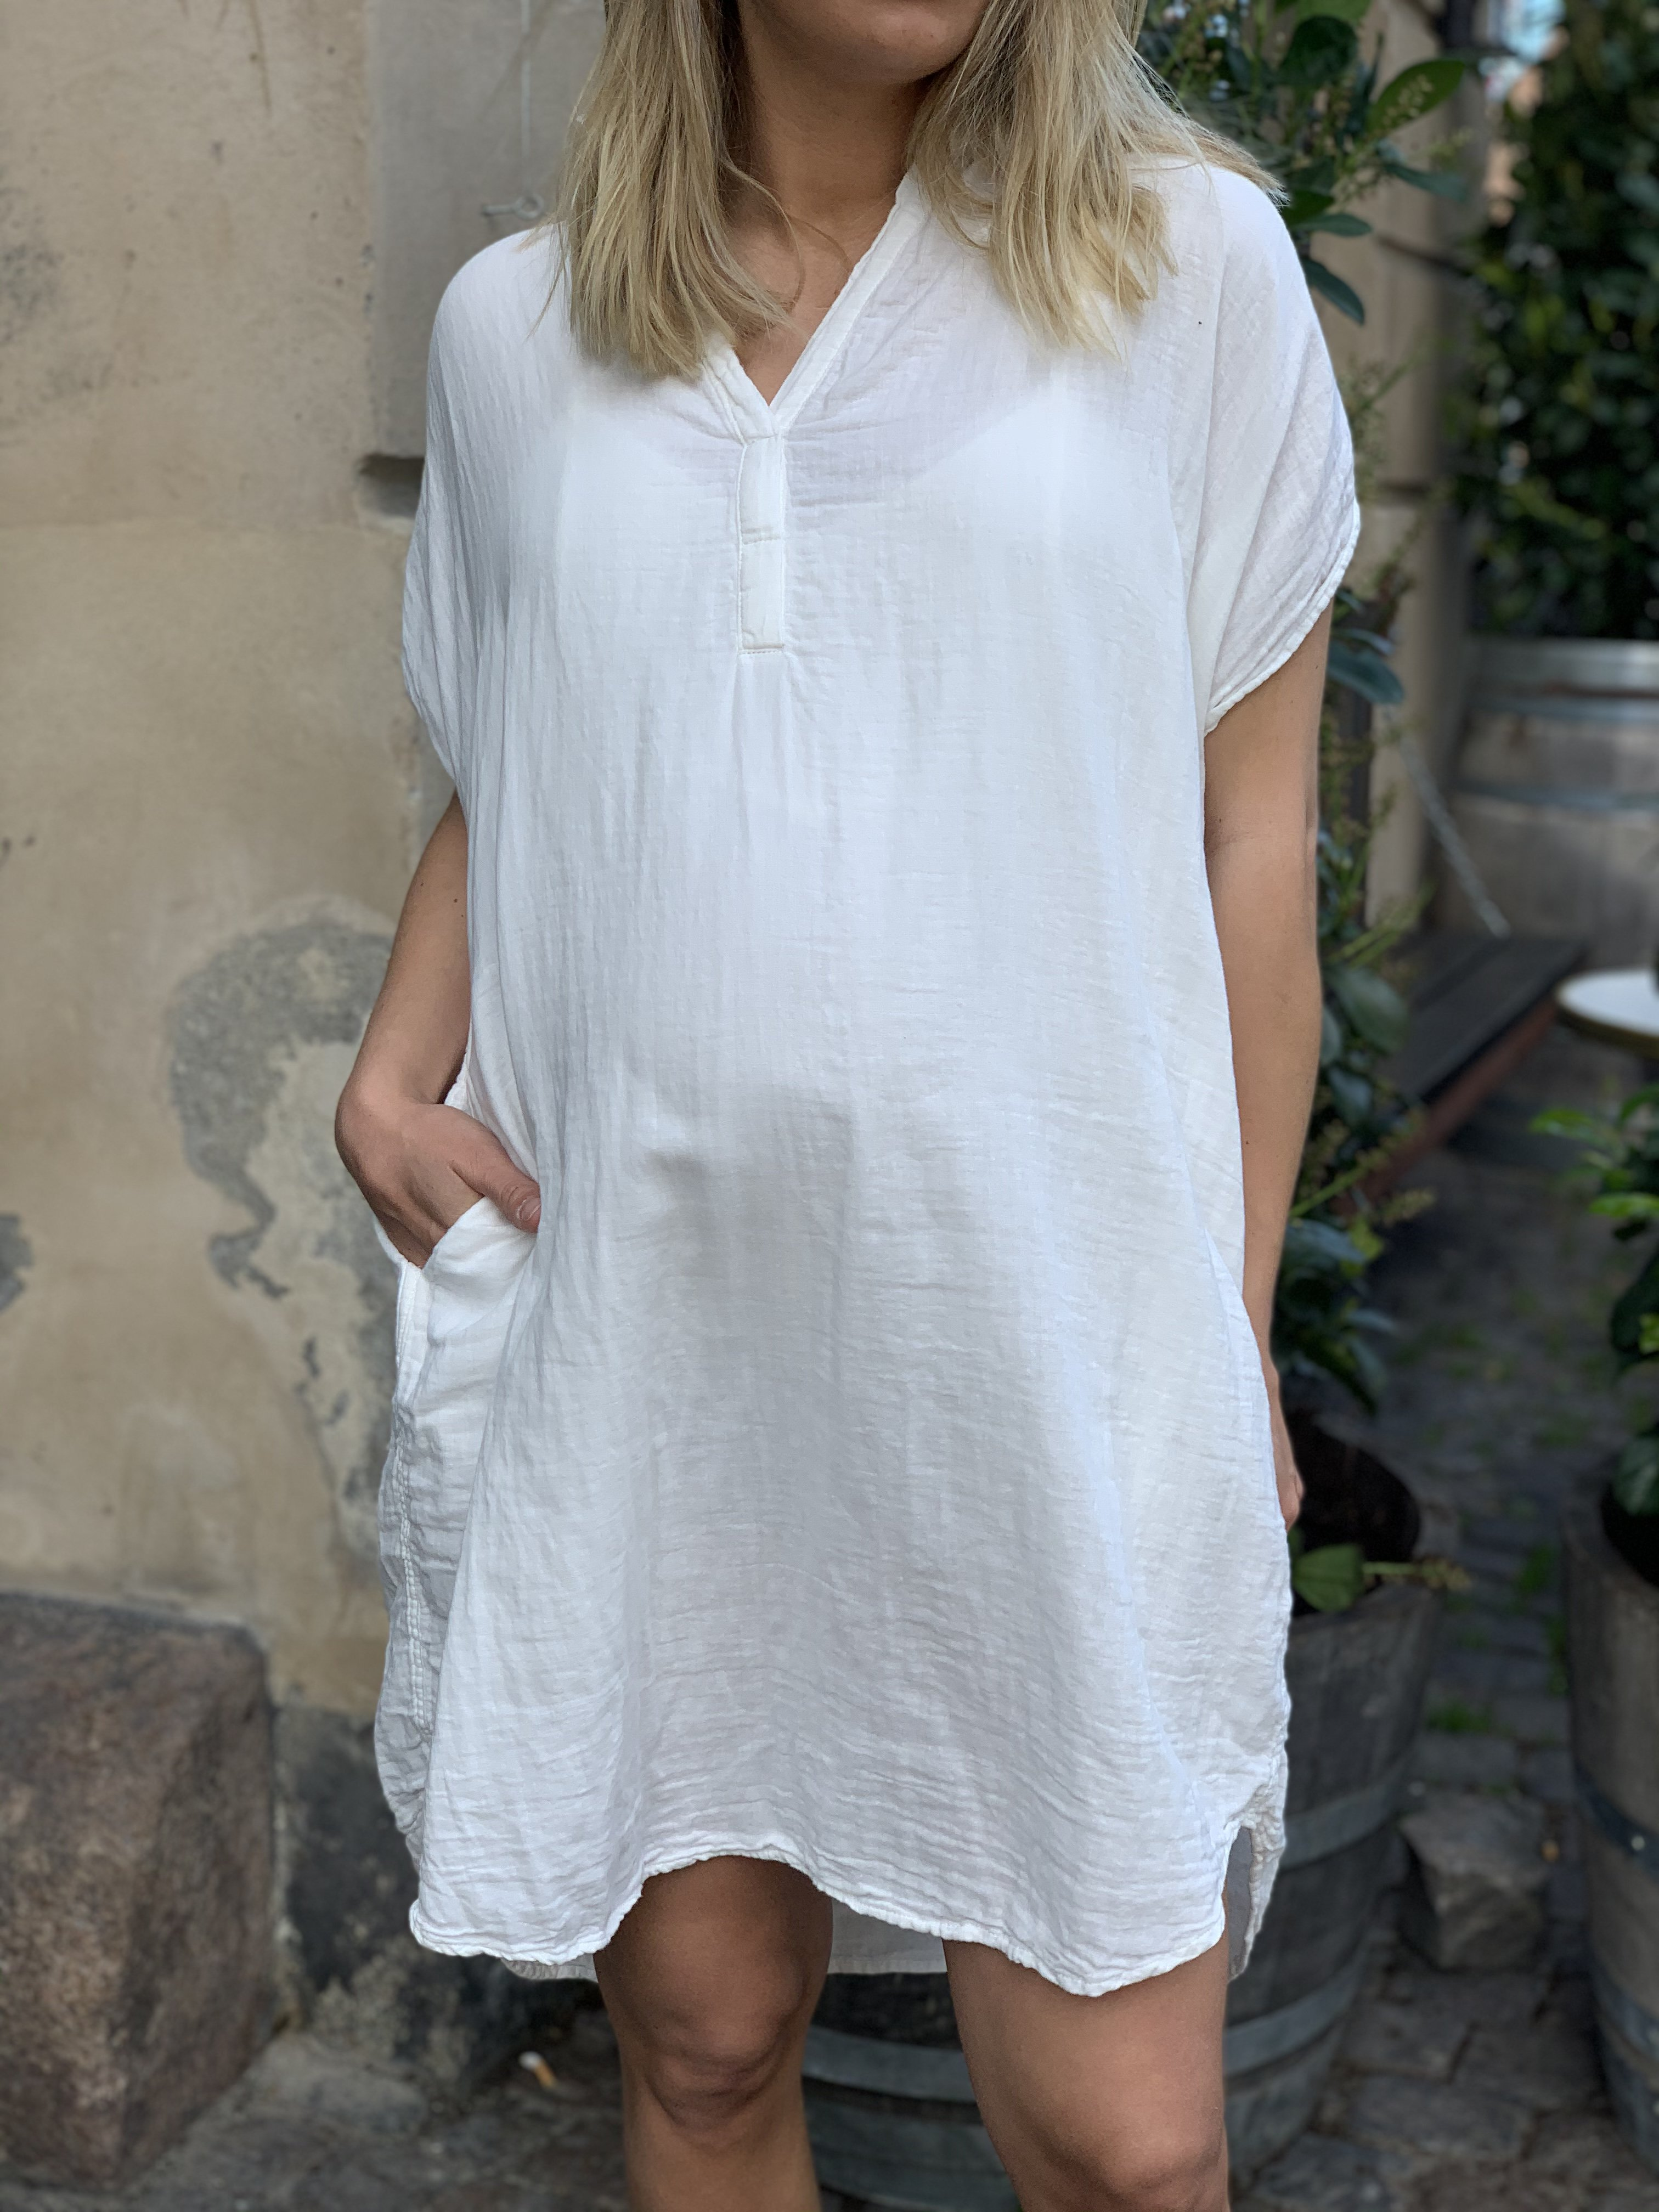 Rabens Saloner Cotton Shirt Dress - White